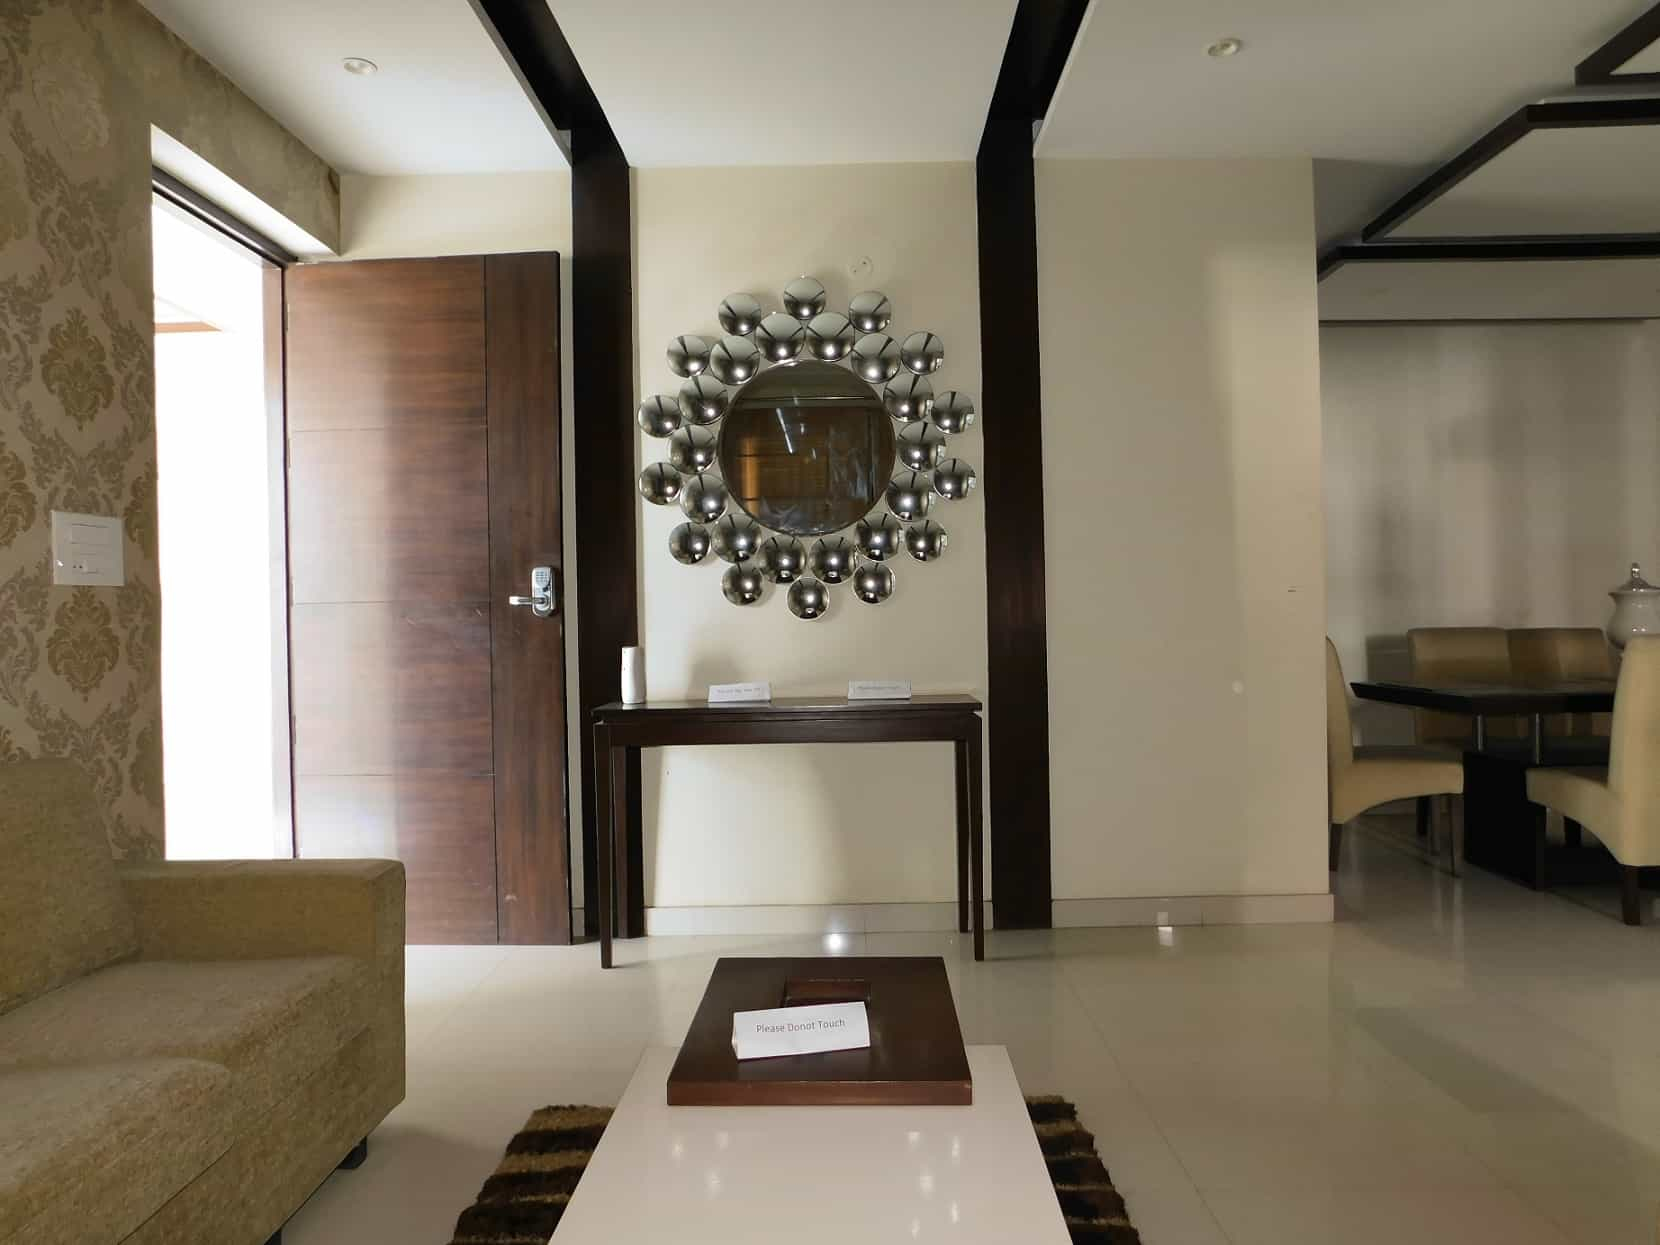 Ubber Palm Heights - Flats in Derabassi - Dewan Realtors